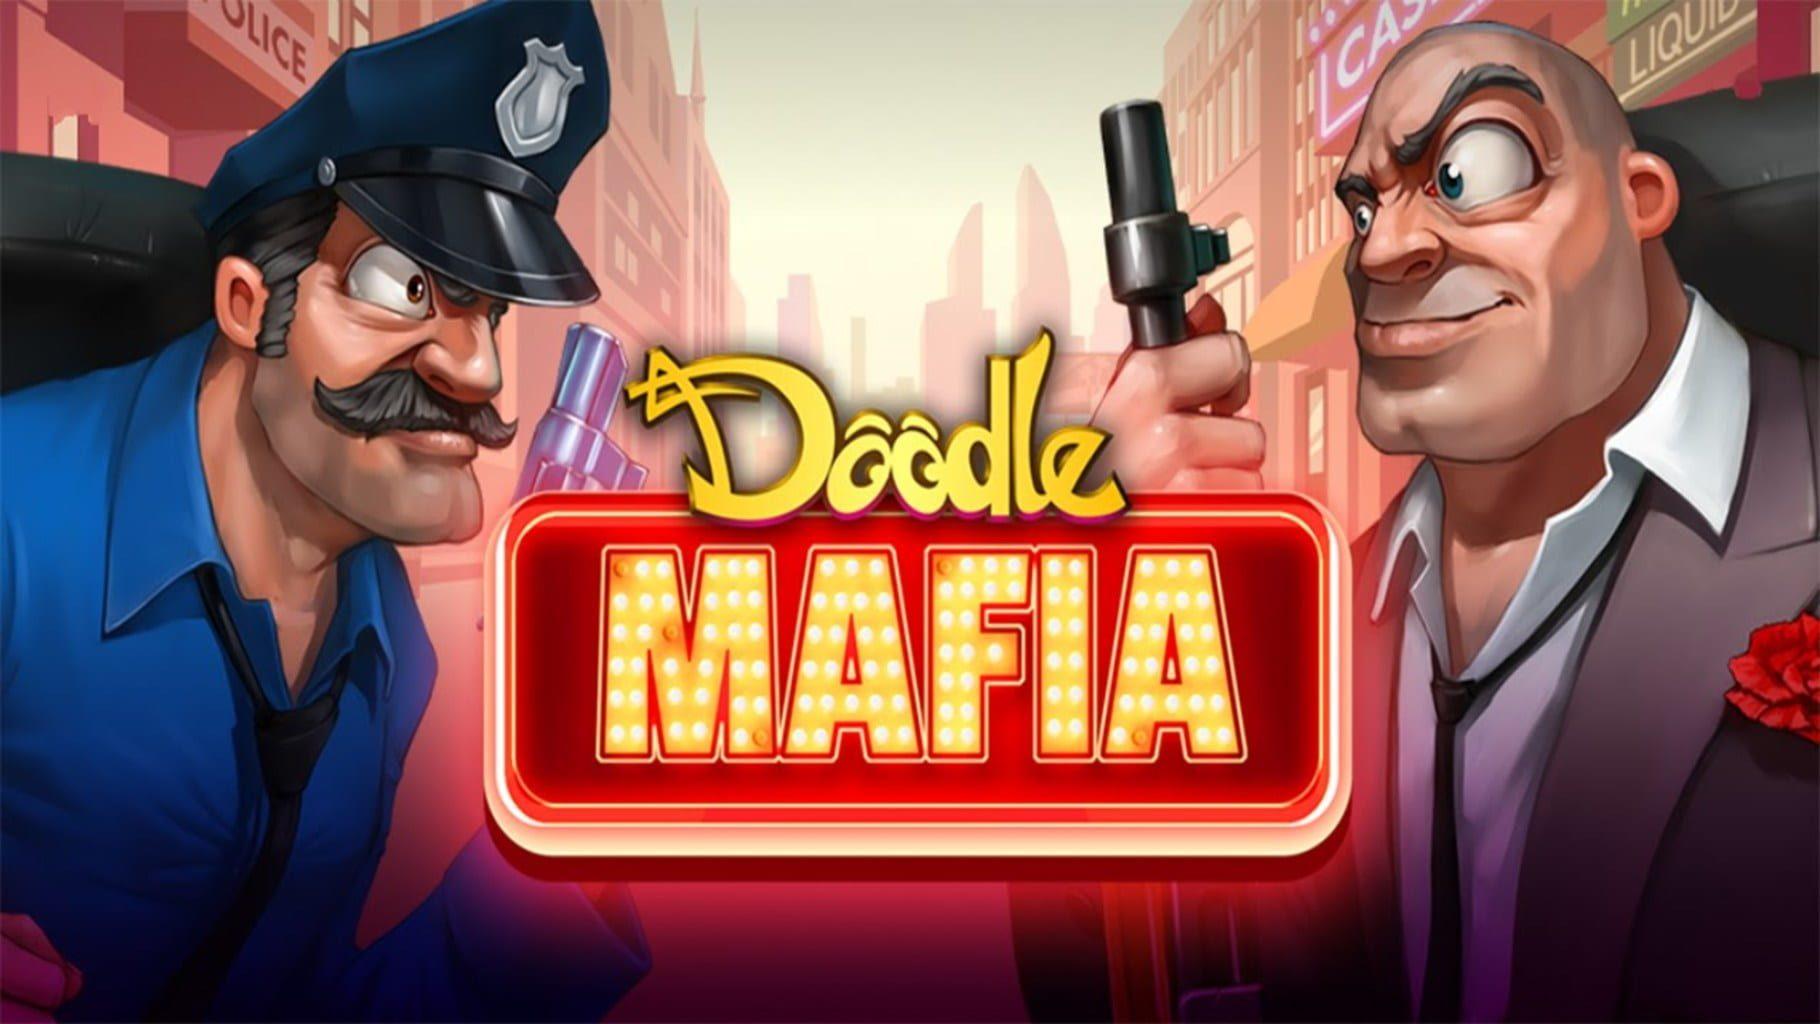 buy Doodle Mafia cd key for pc platform